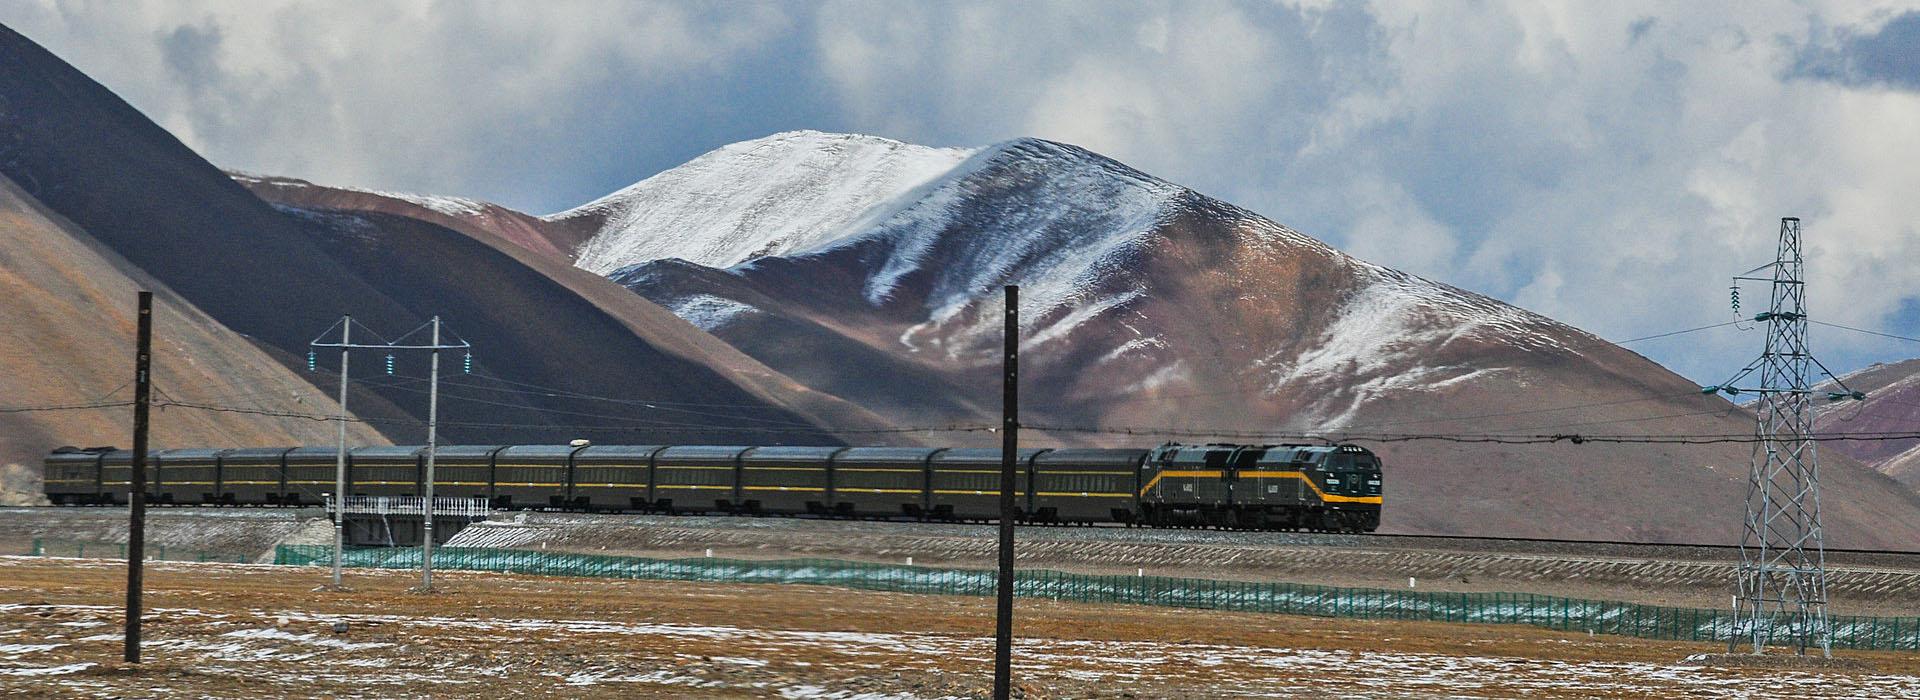 Travel into Tibet through the World's Highest Railway